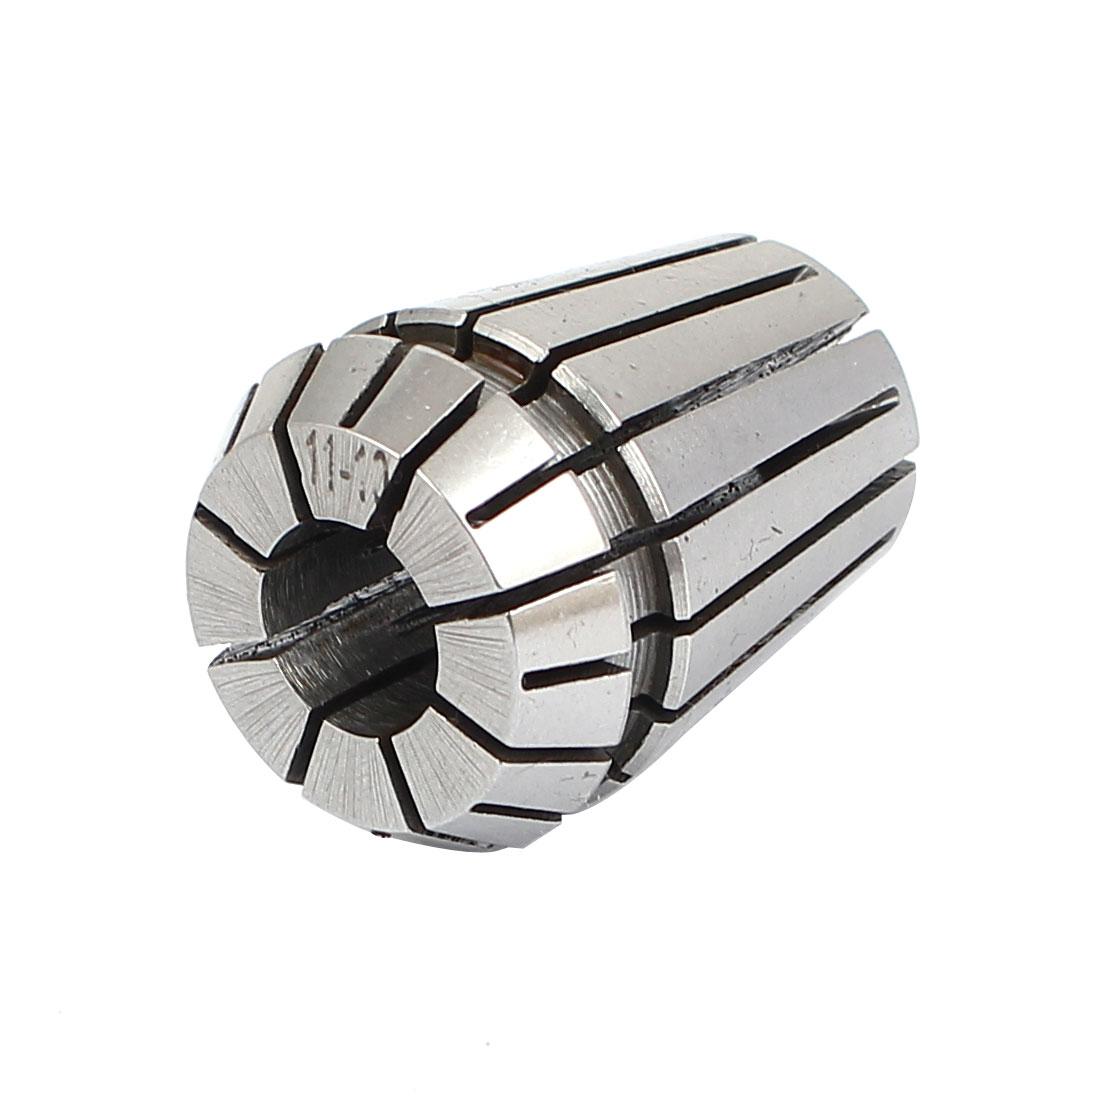 ER25 11mm Clamping Dia CNC Engraving Milling Machine Spring Collet